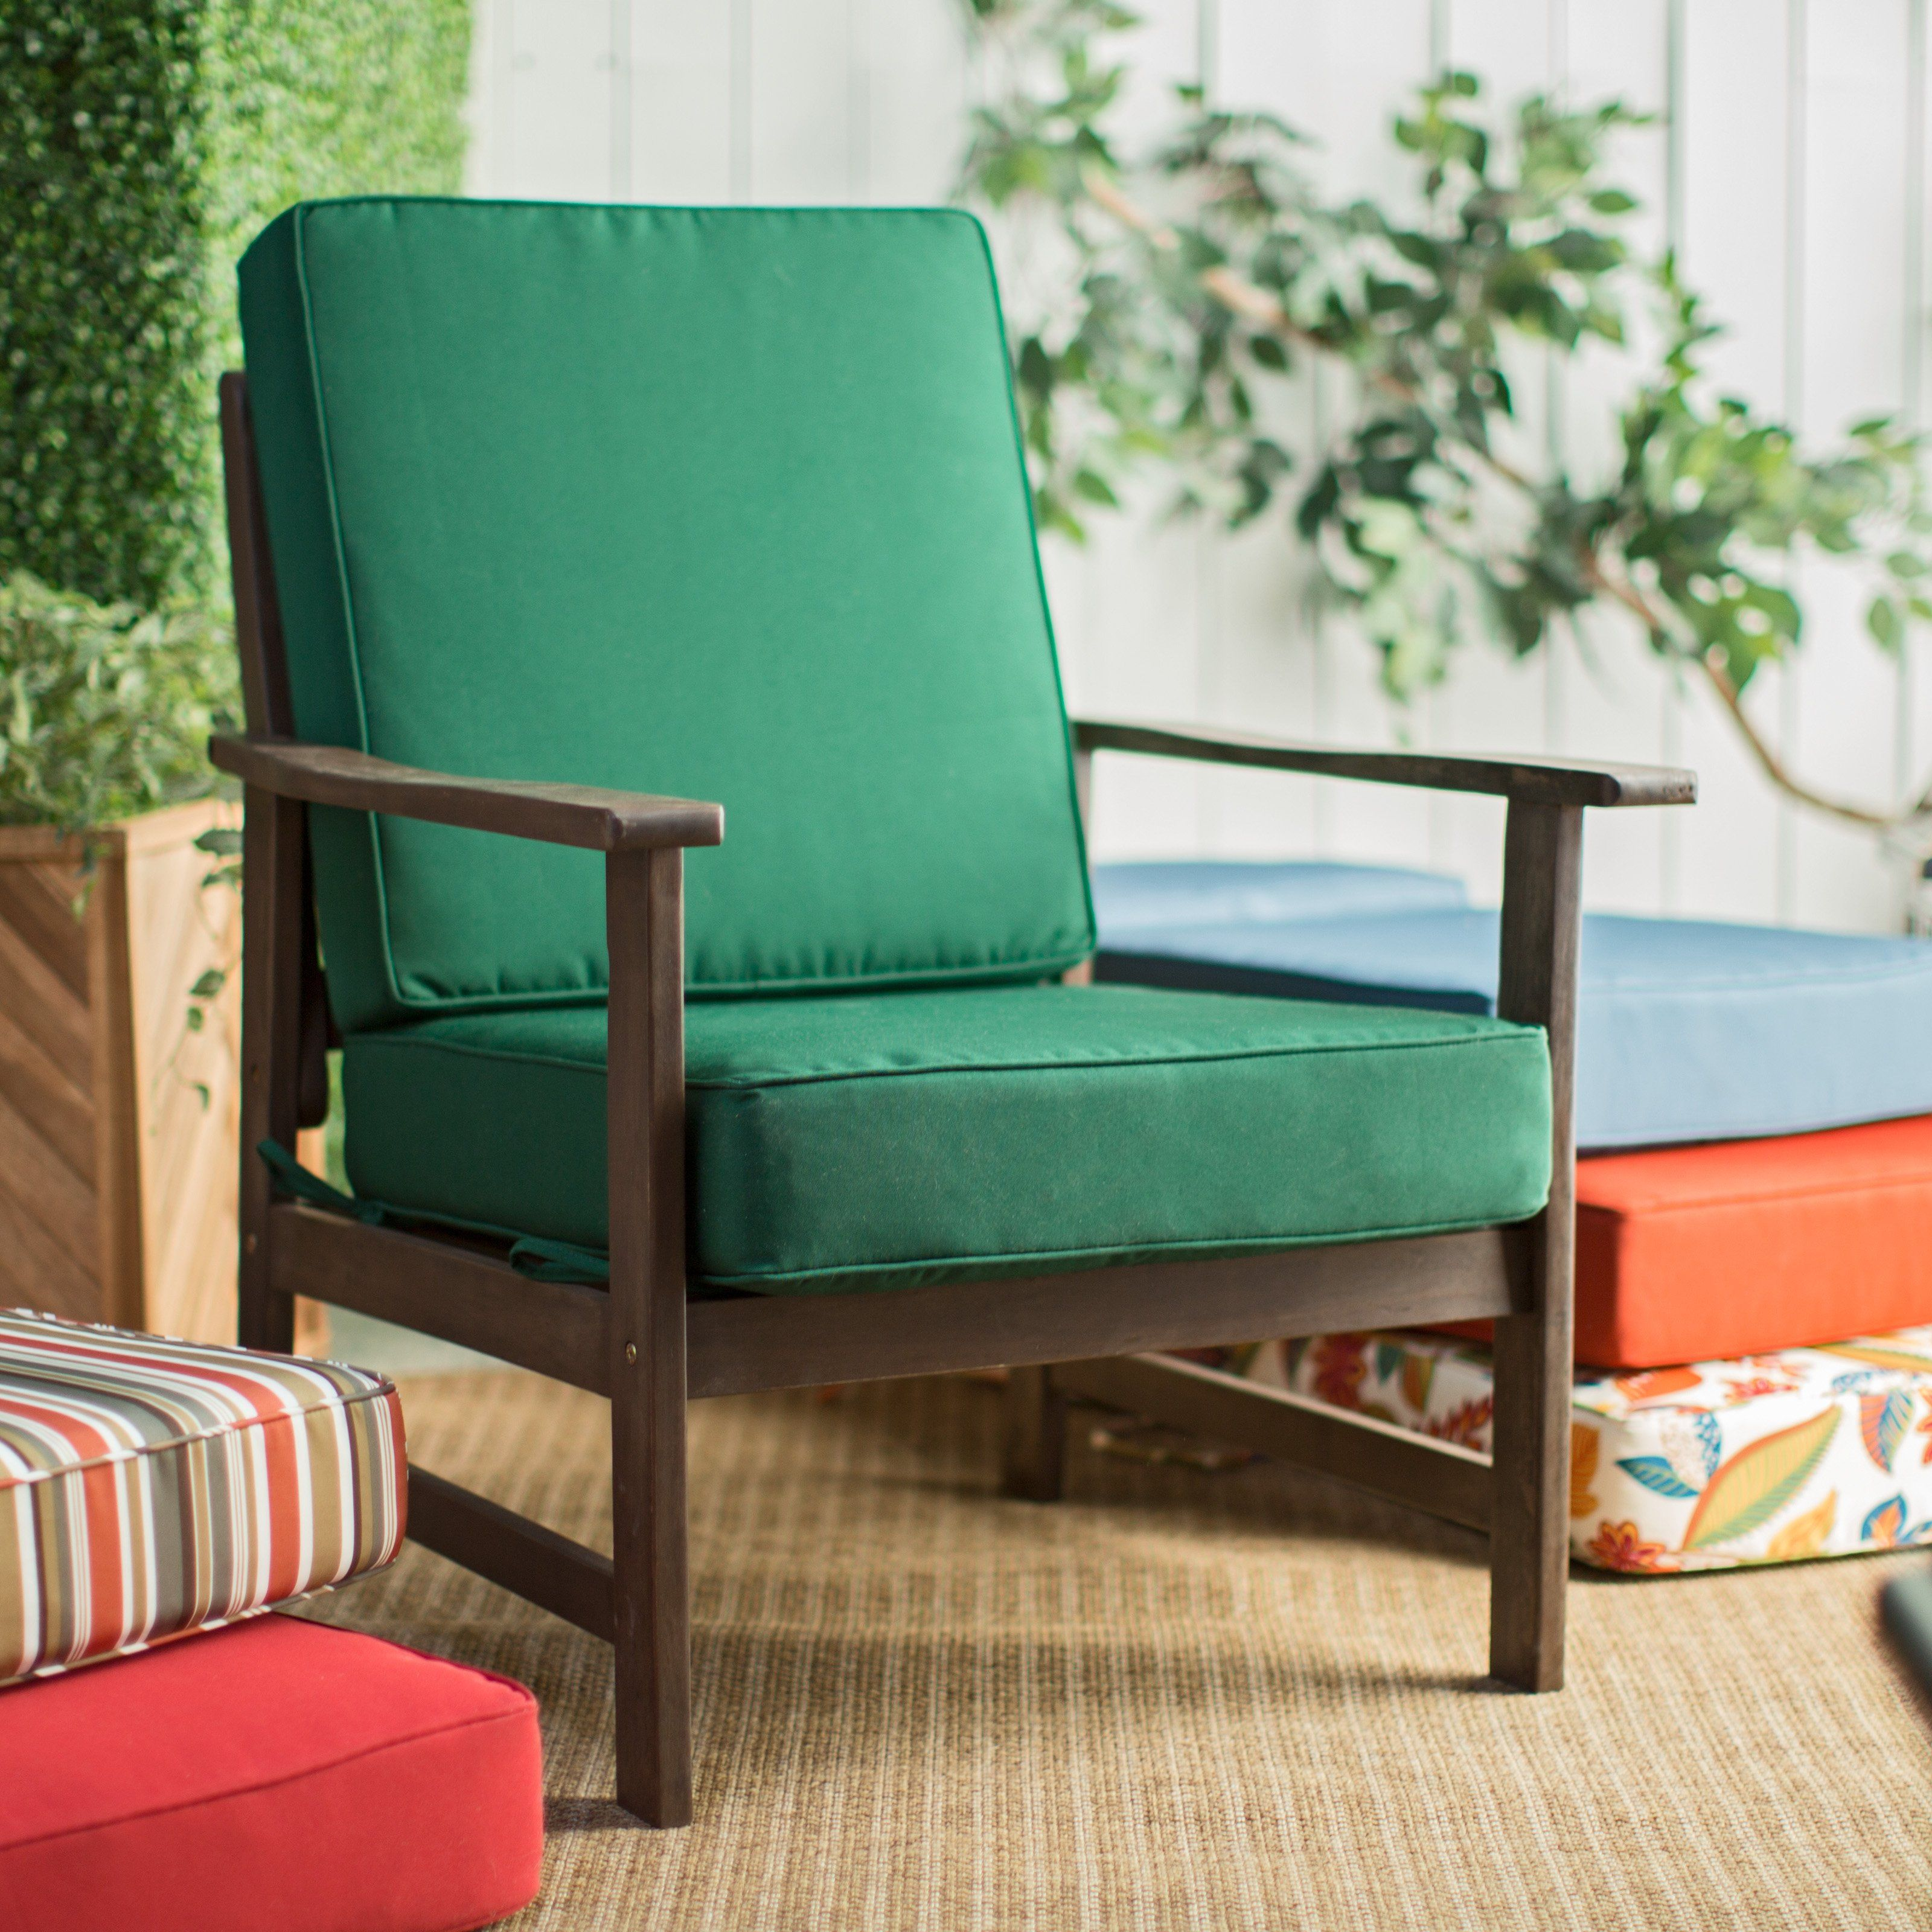 Hinged Outdoor Deep Seating Cushion